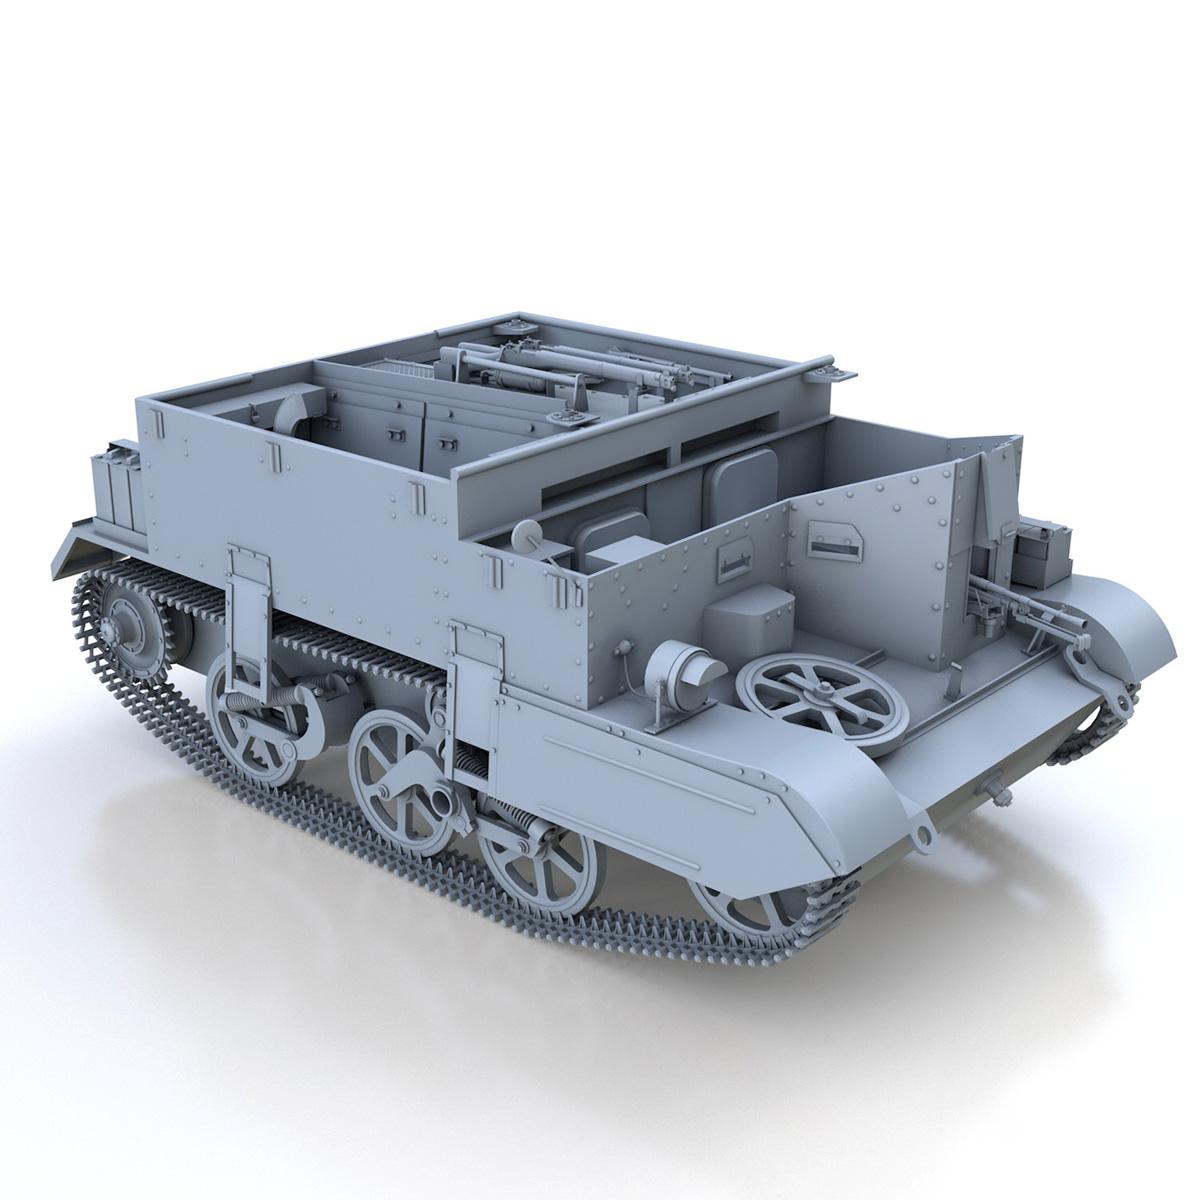 Universal Carrier MK II - Bren Gun Carrier 3d model 3ds fbx c4d lwo lws lw obj 272964